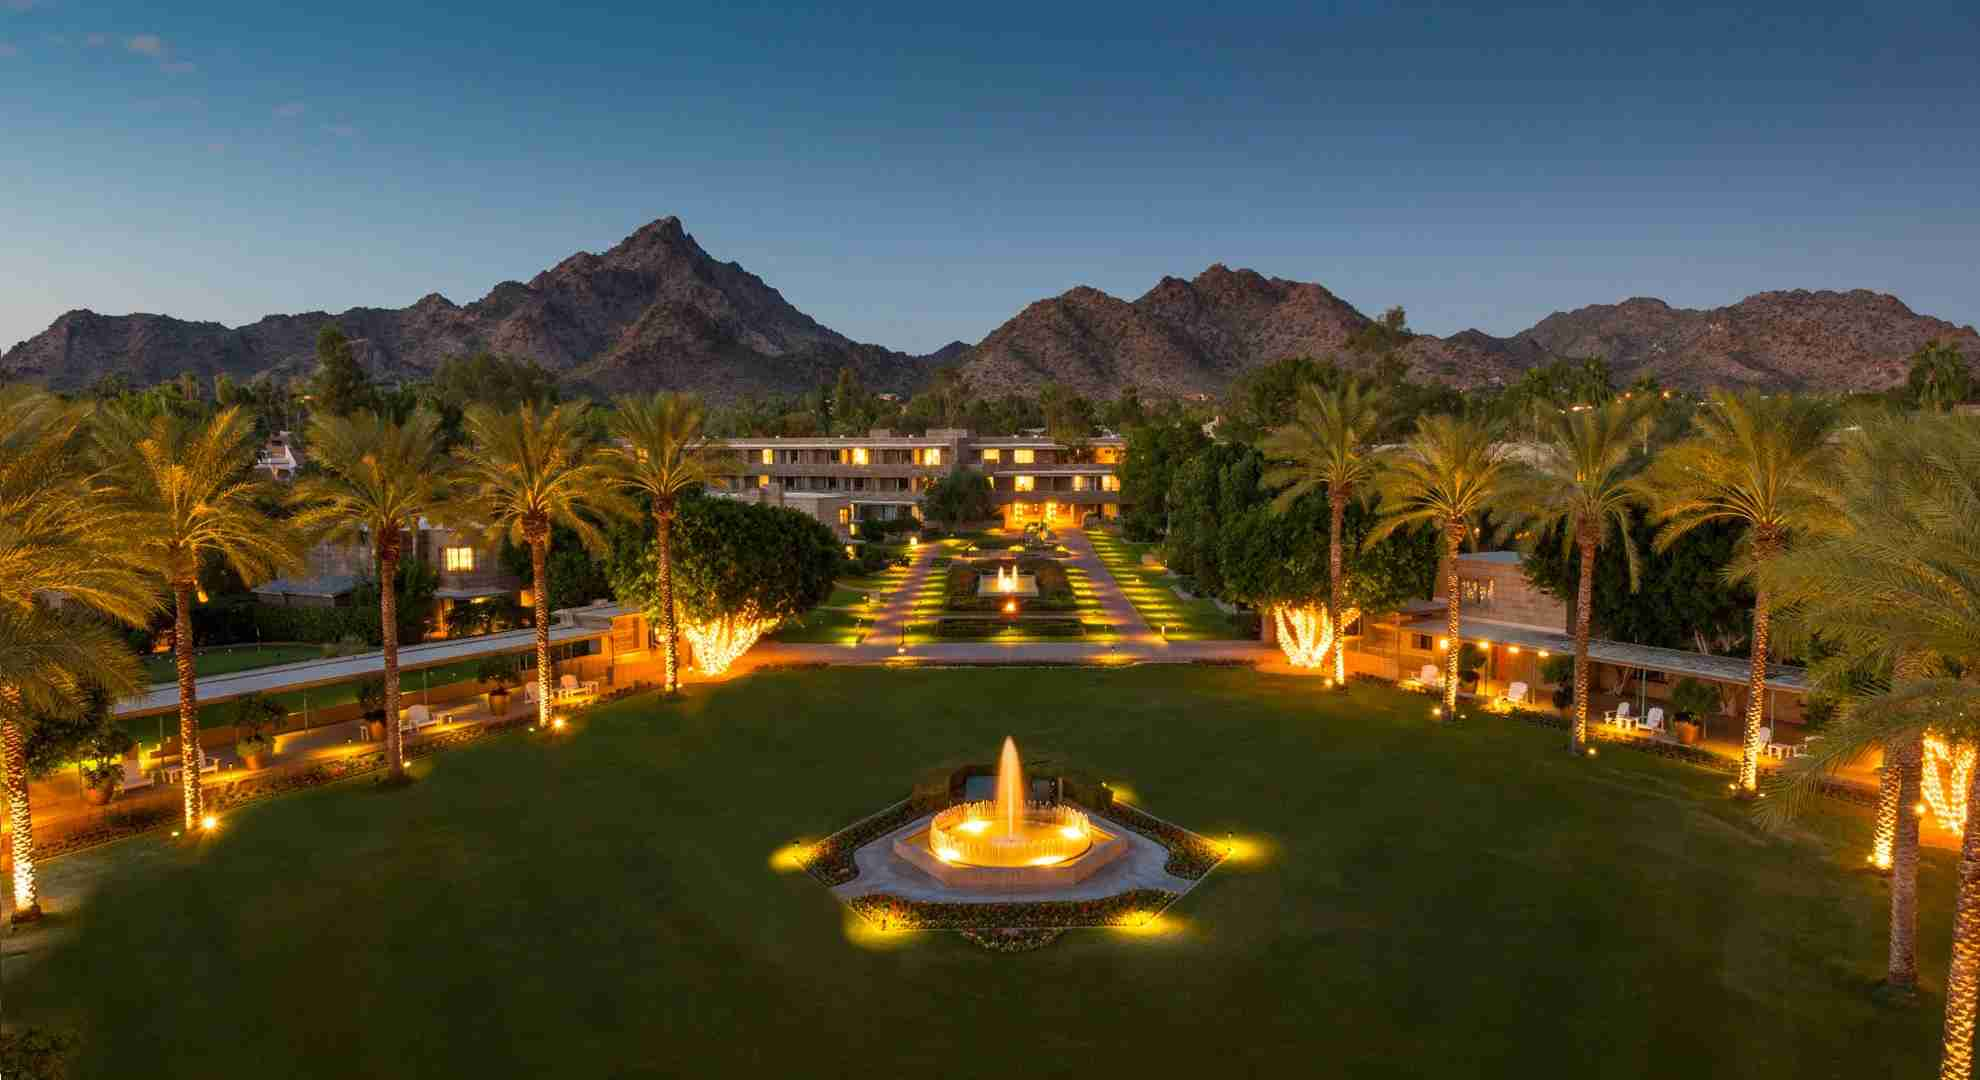 Arizona Biltmore, A Waldorf Astoria Resort (Photo gracieuseté de l'hôtel)